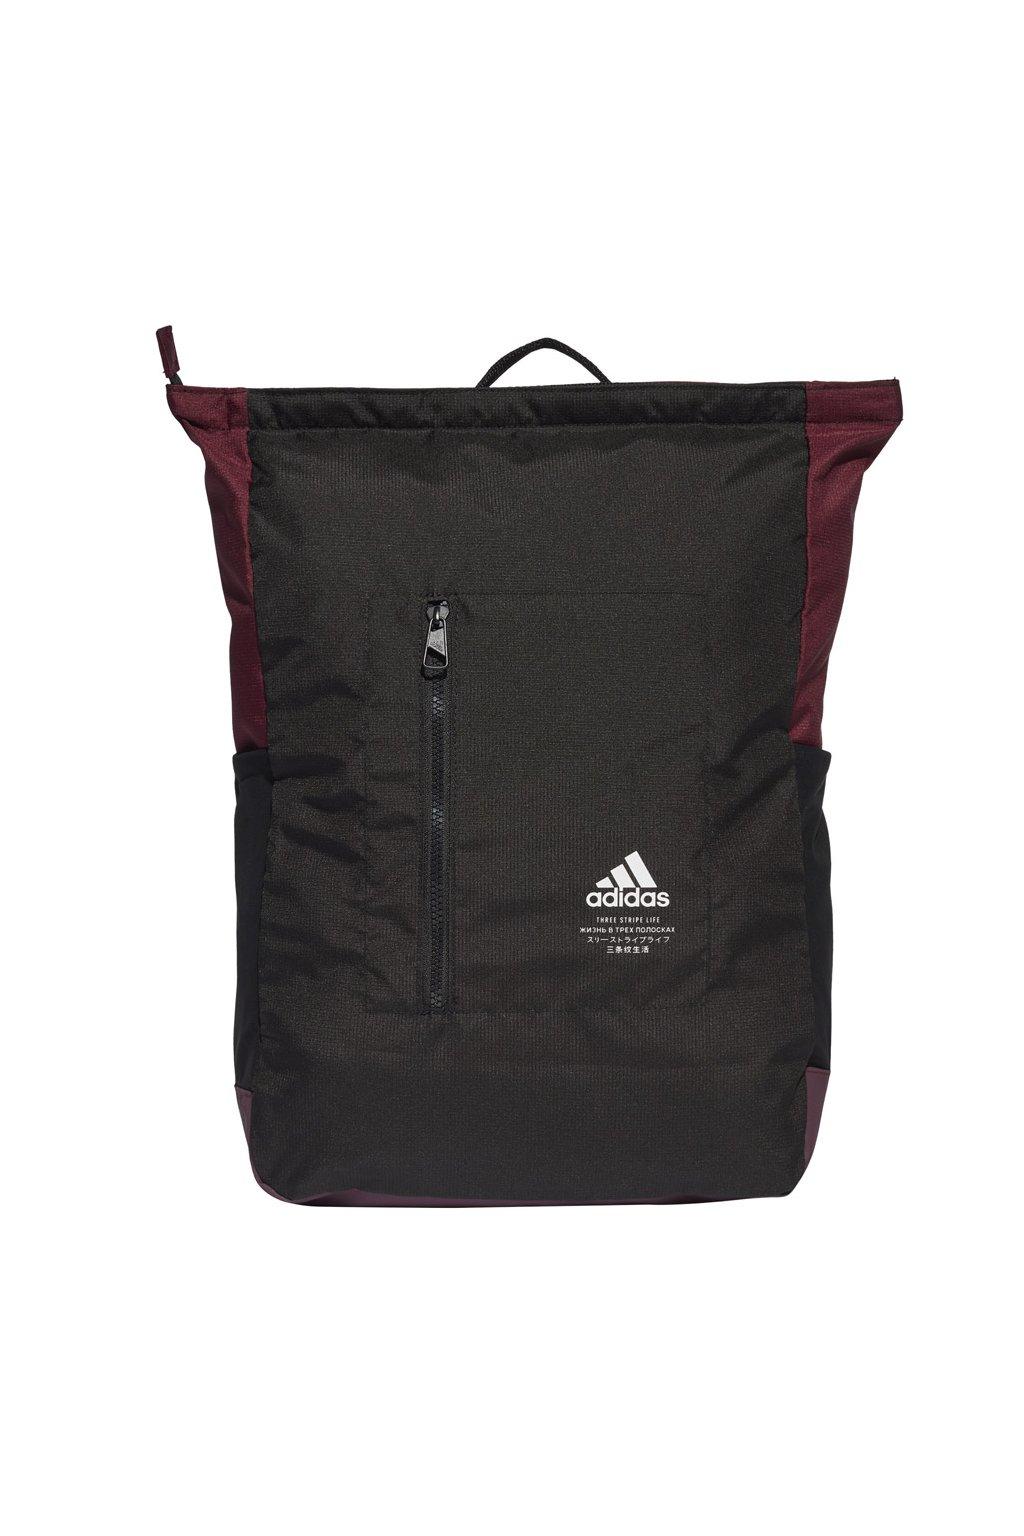 Batoh adidas Classic BP TOP ZIP čierno-bordový FS8339